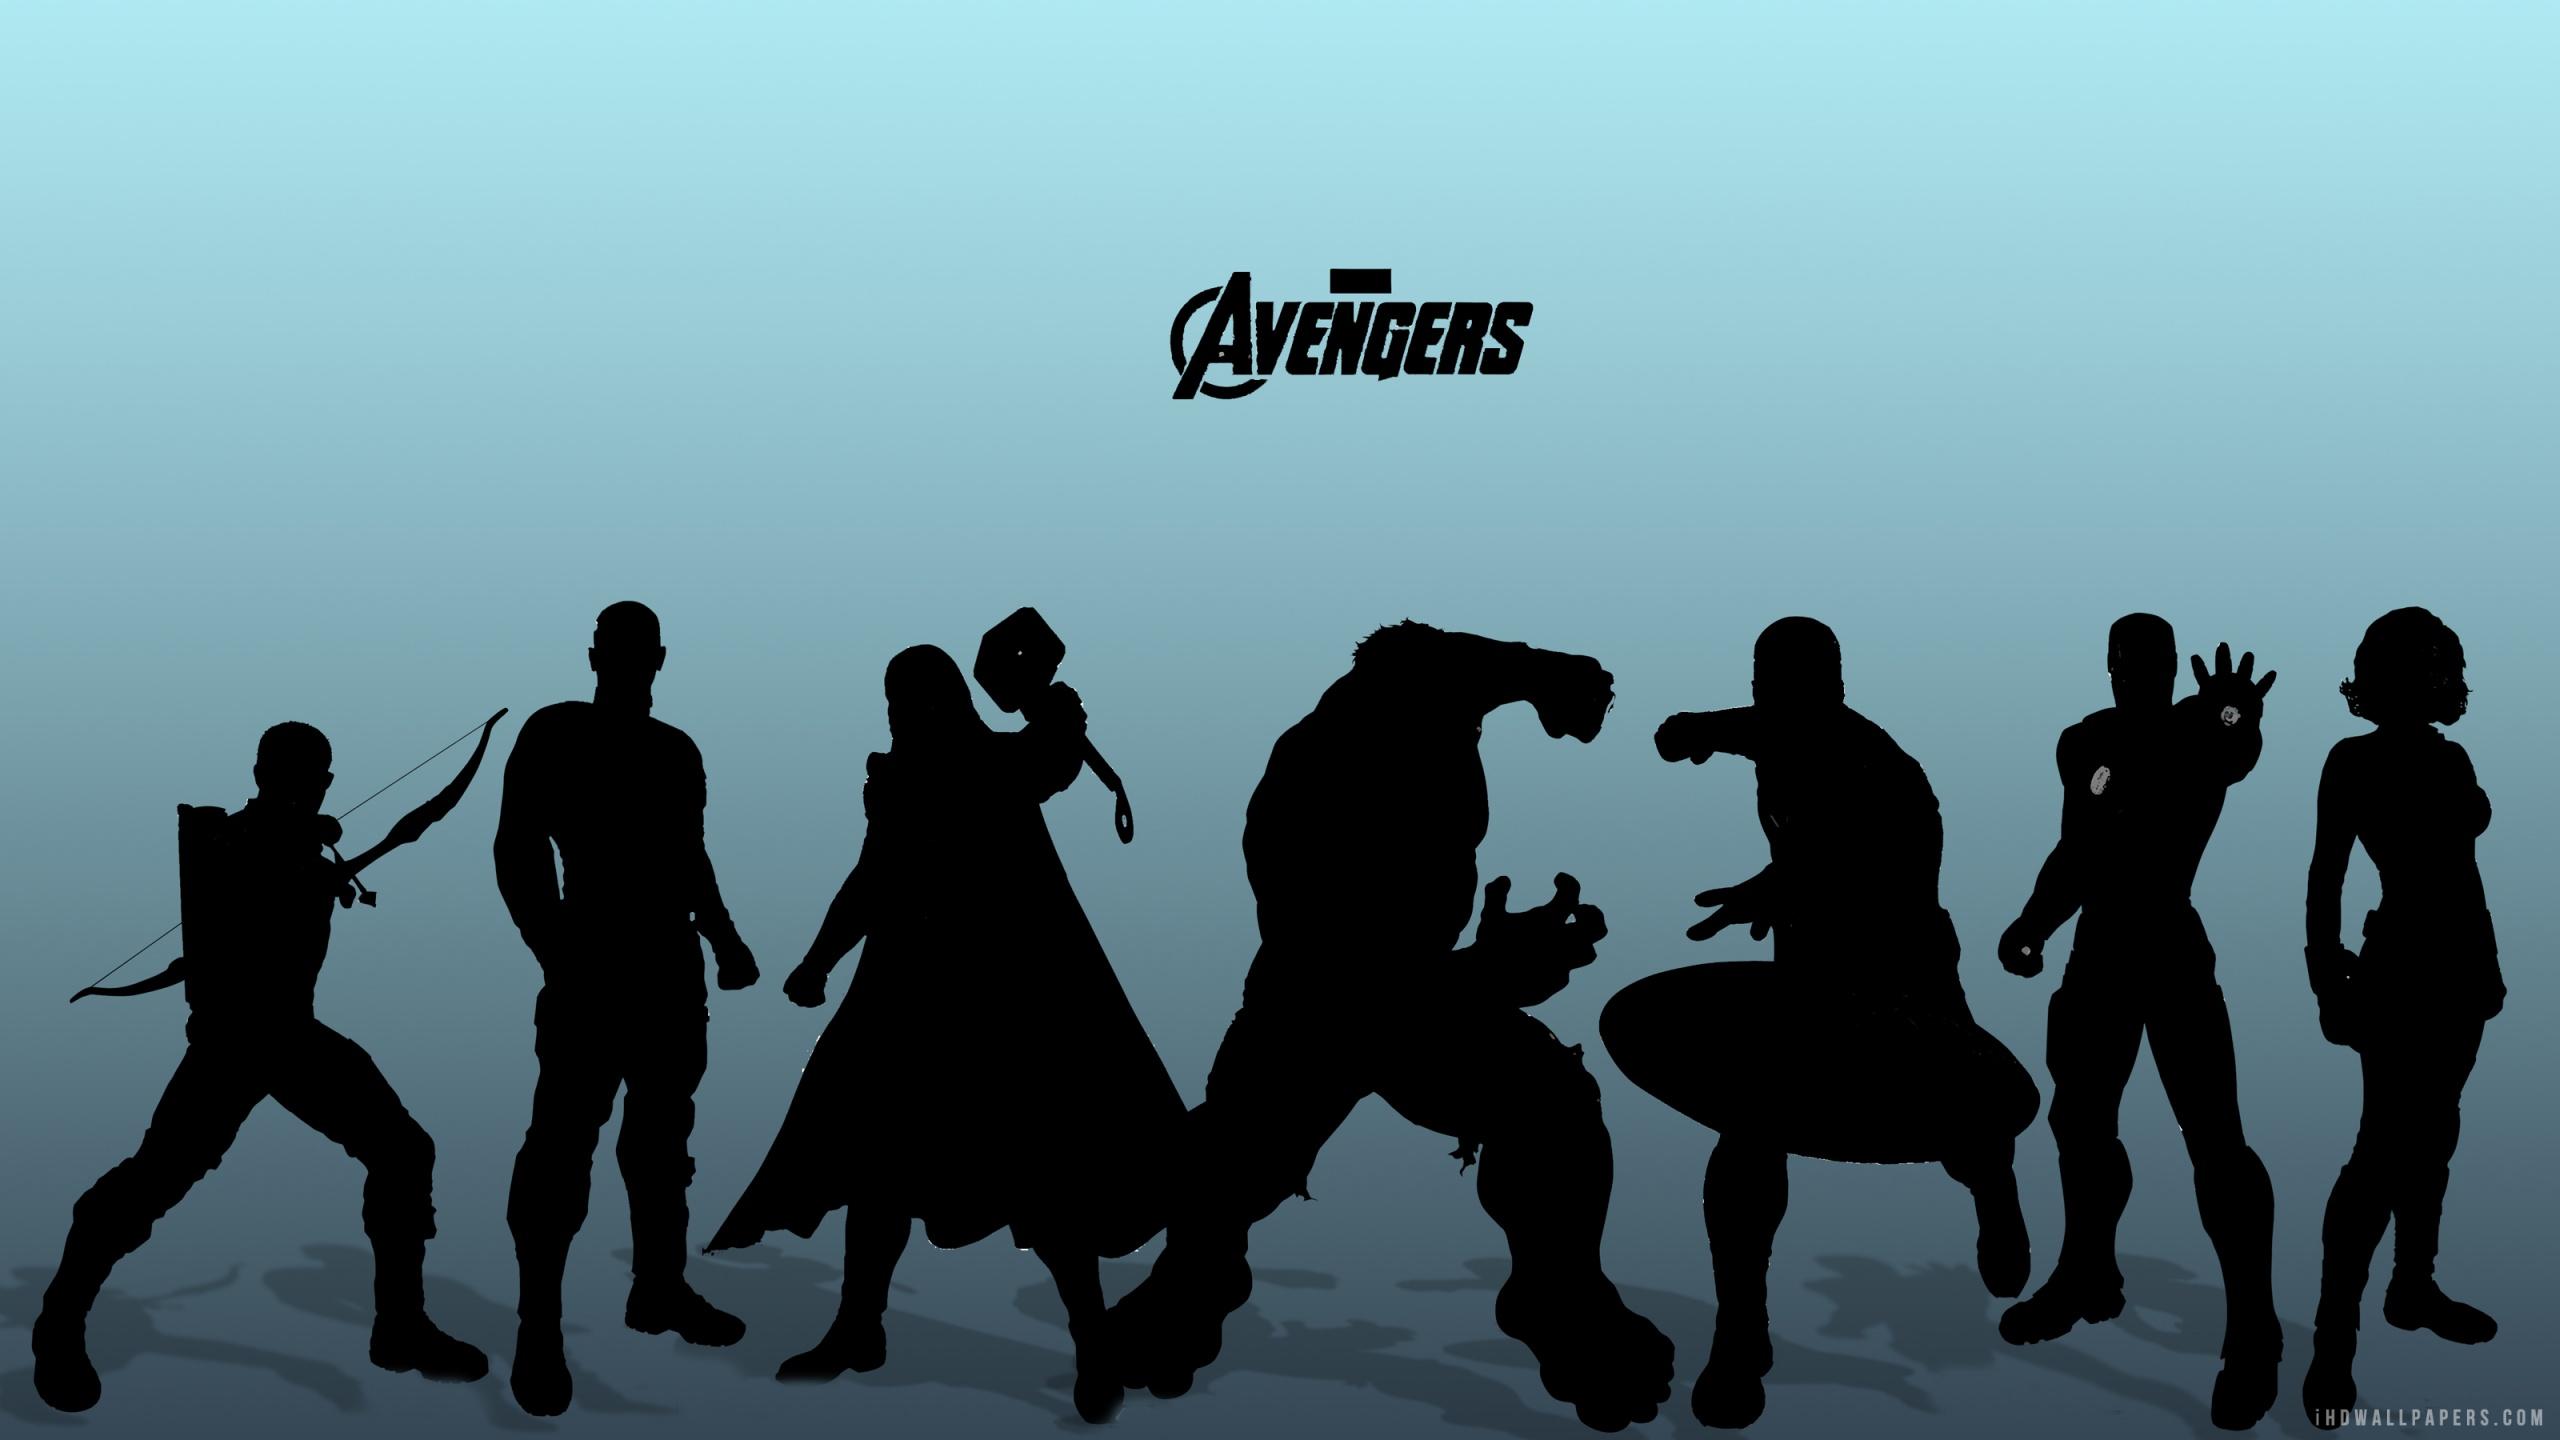 Avengers Superheroes HD Wide Wallpaper   2560x1440 Resolution 2560x1440